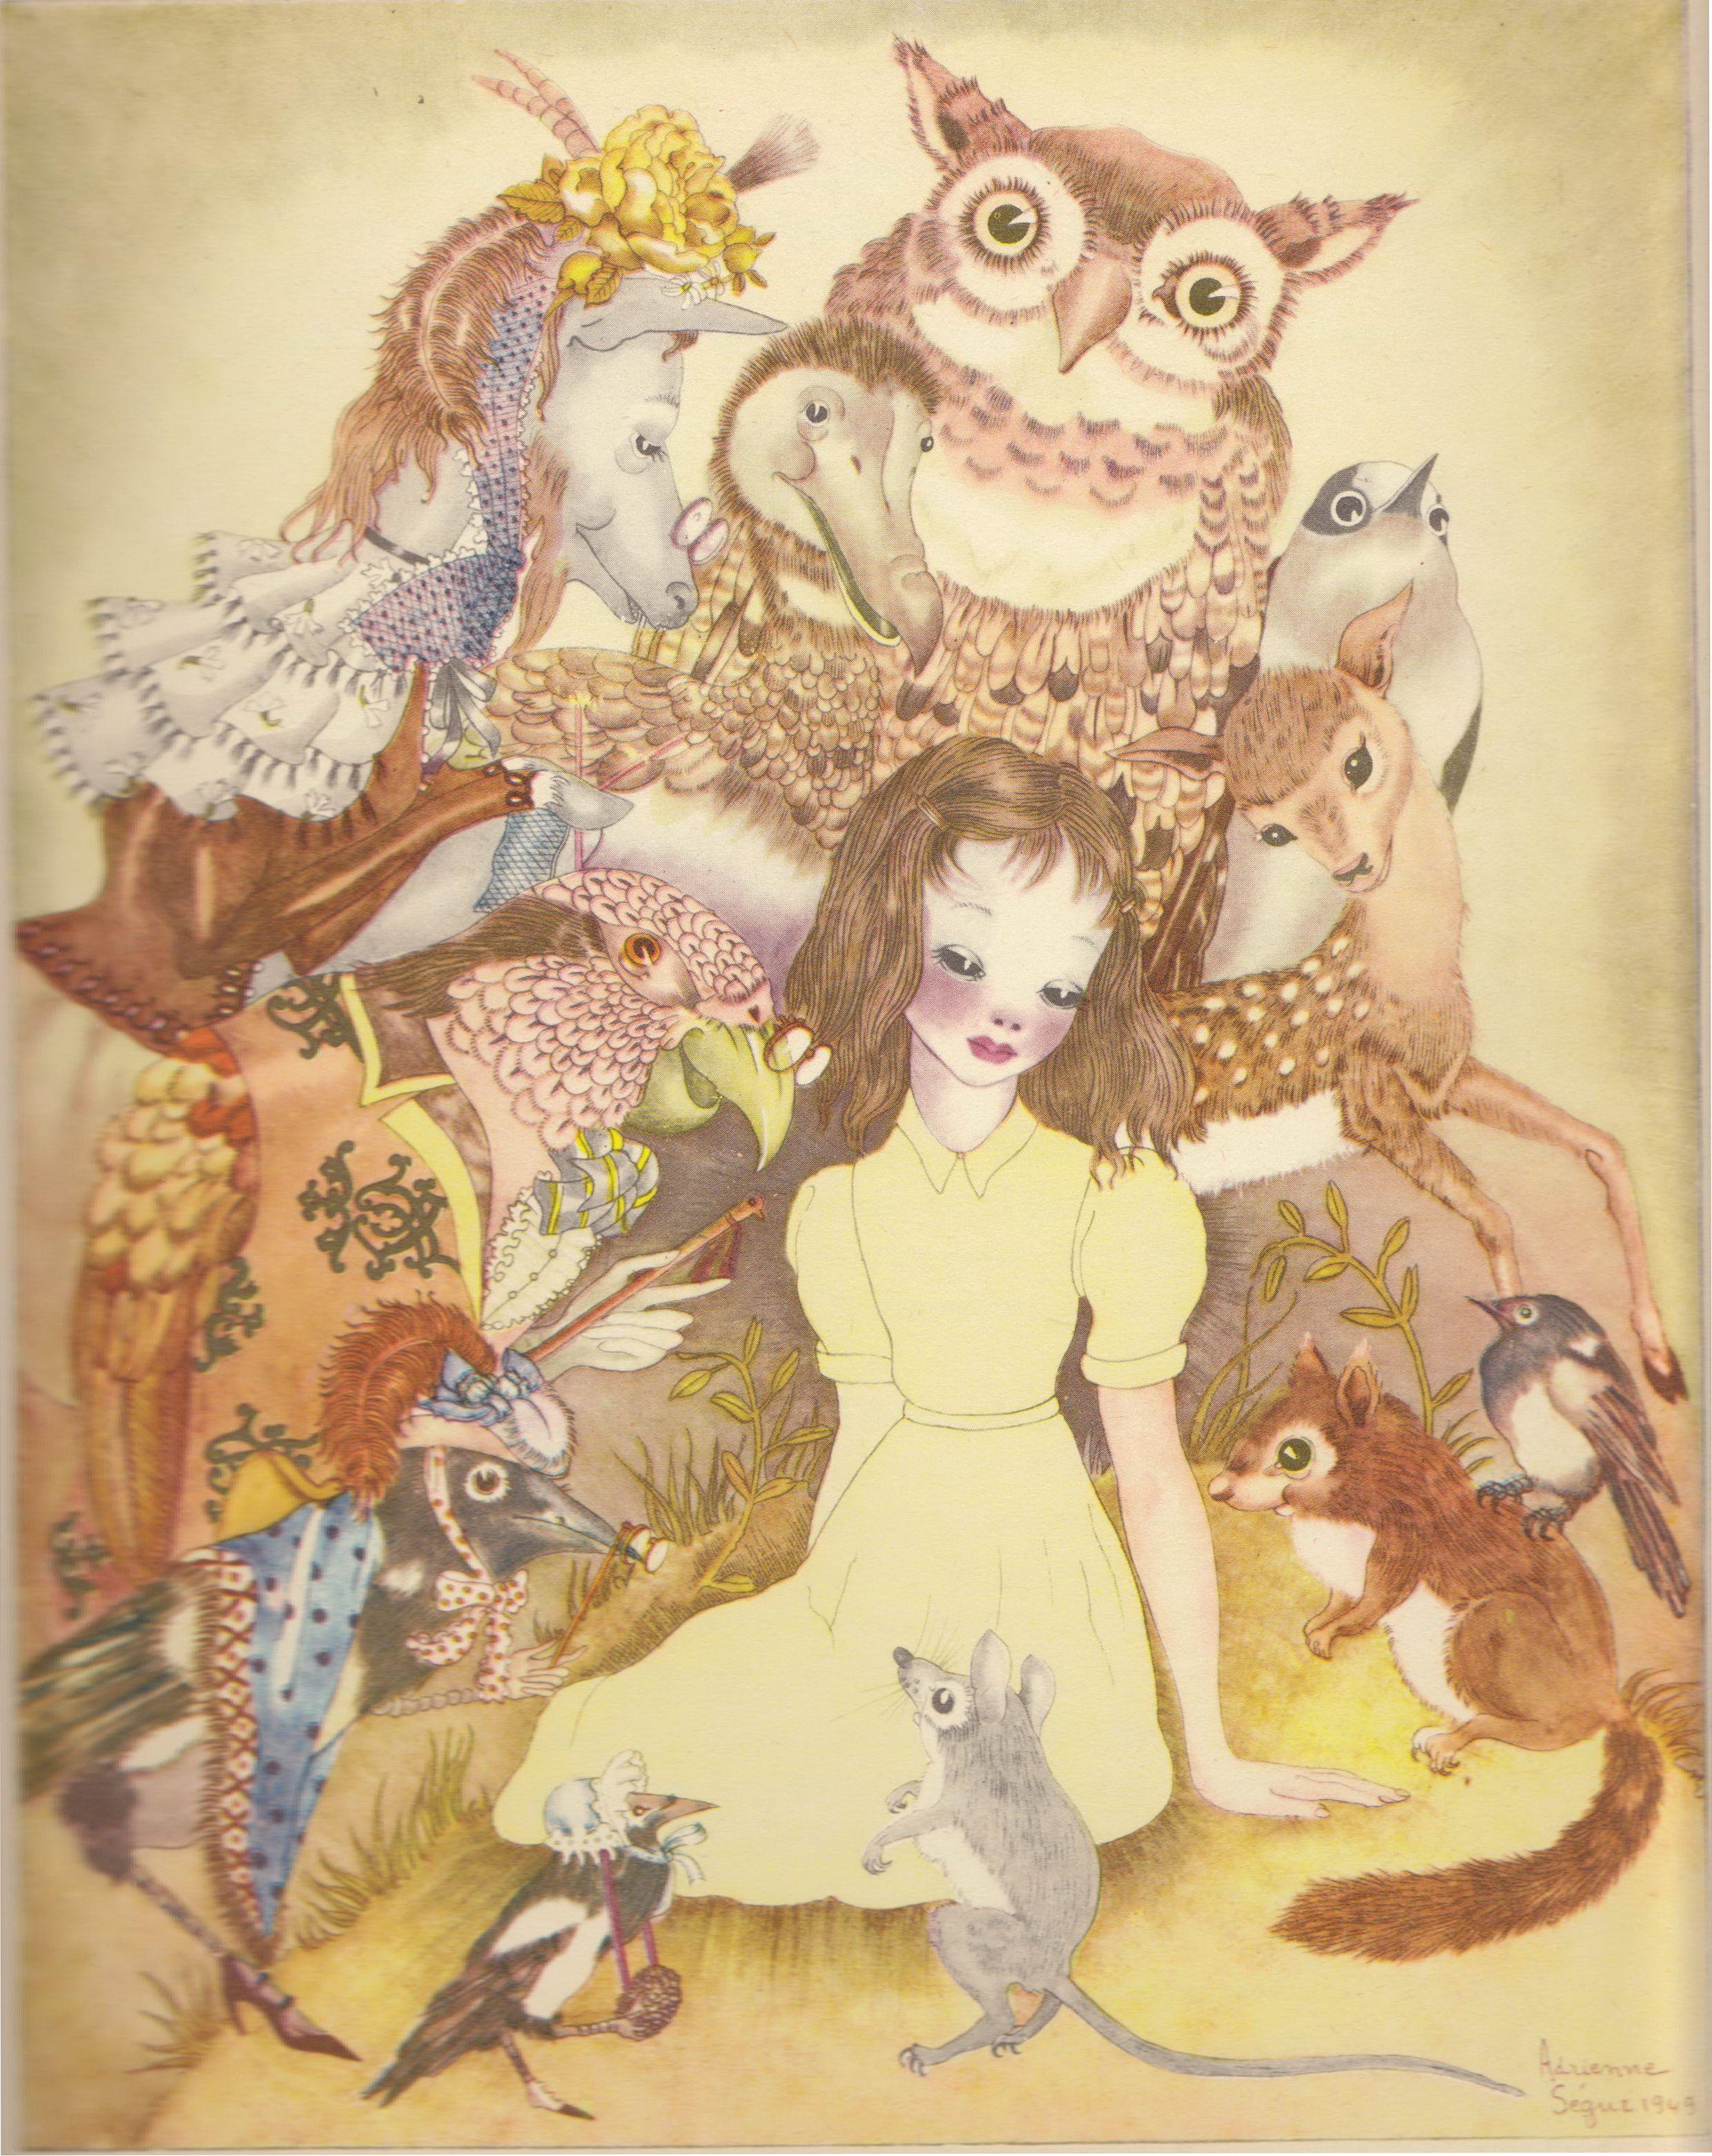 4 of 21 illustrations by Adrienne Segur in Alice in Wonderland